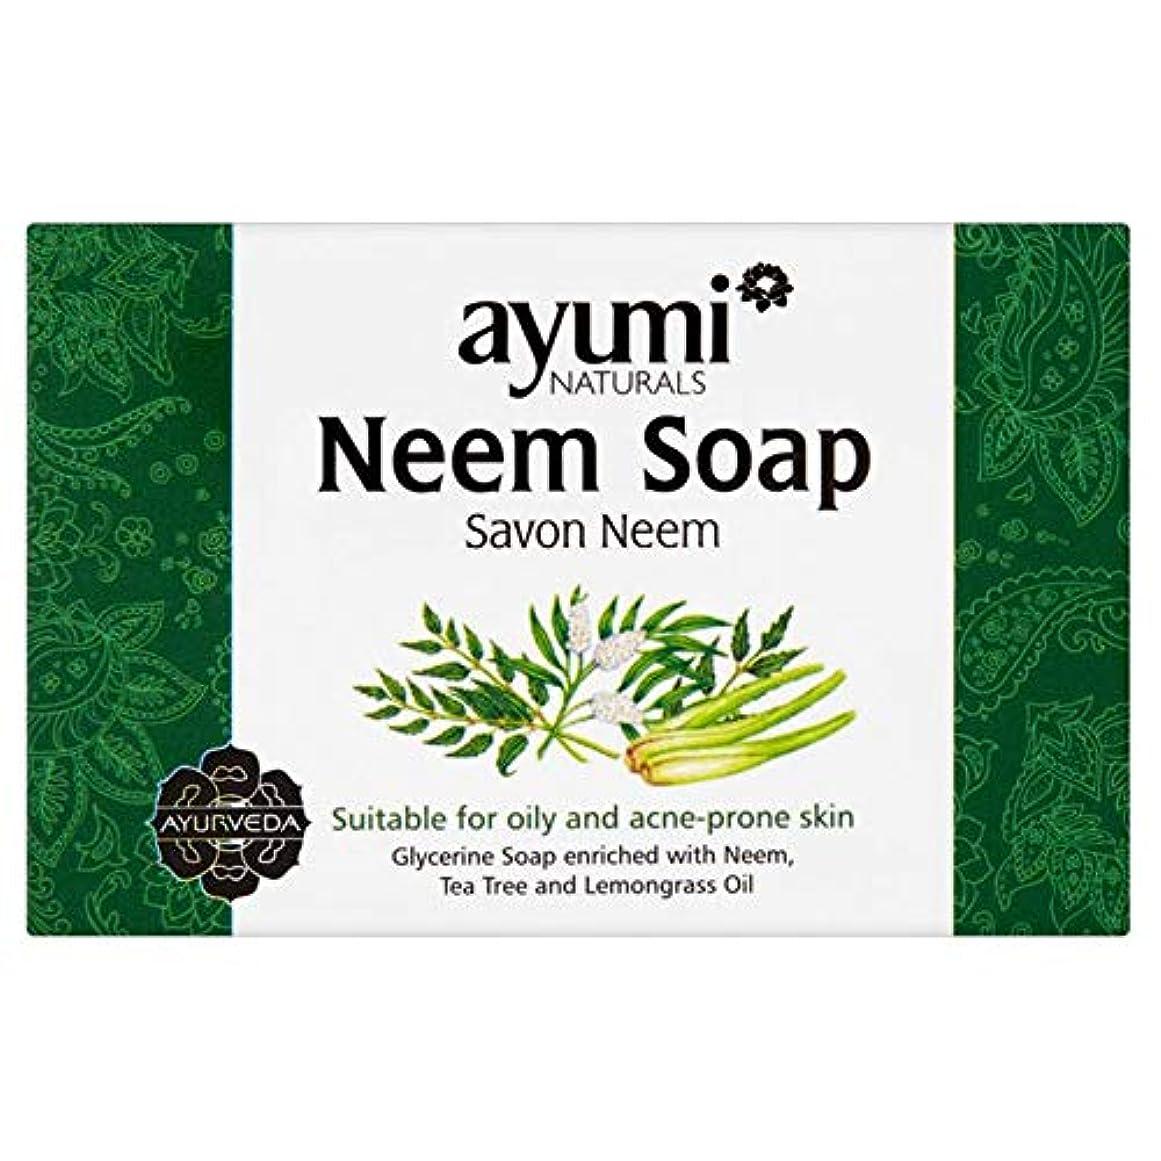 Ayuuri Ayurvedic Herbal Natural Neem Soap 100g by Ayuuri